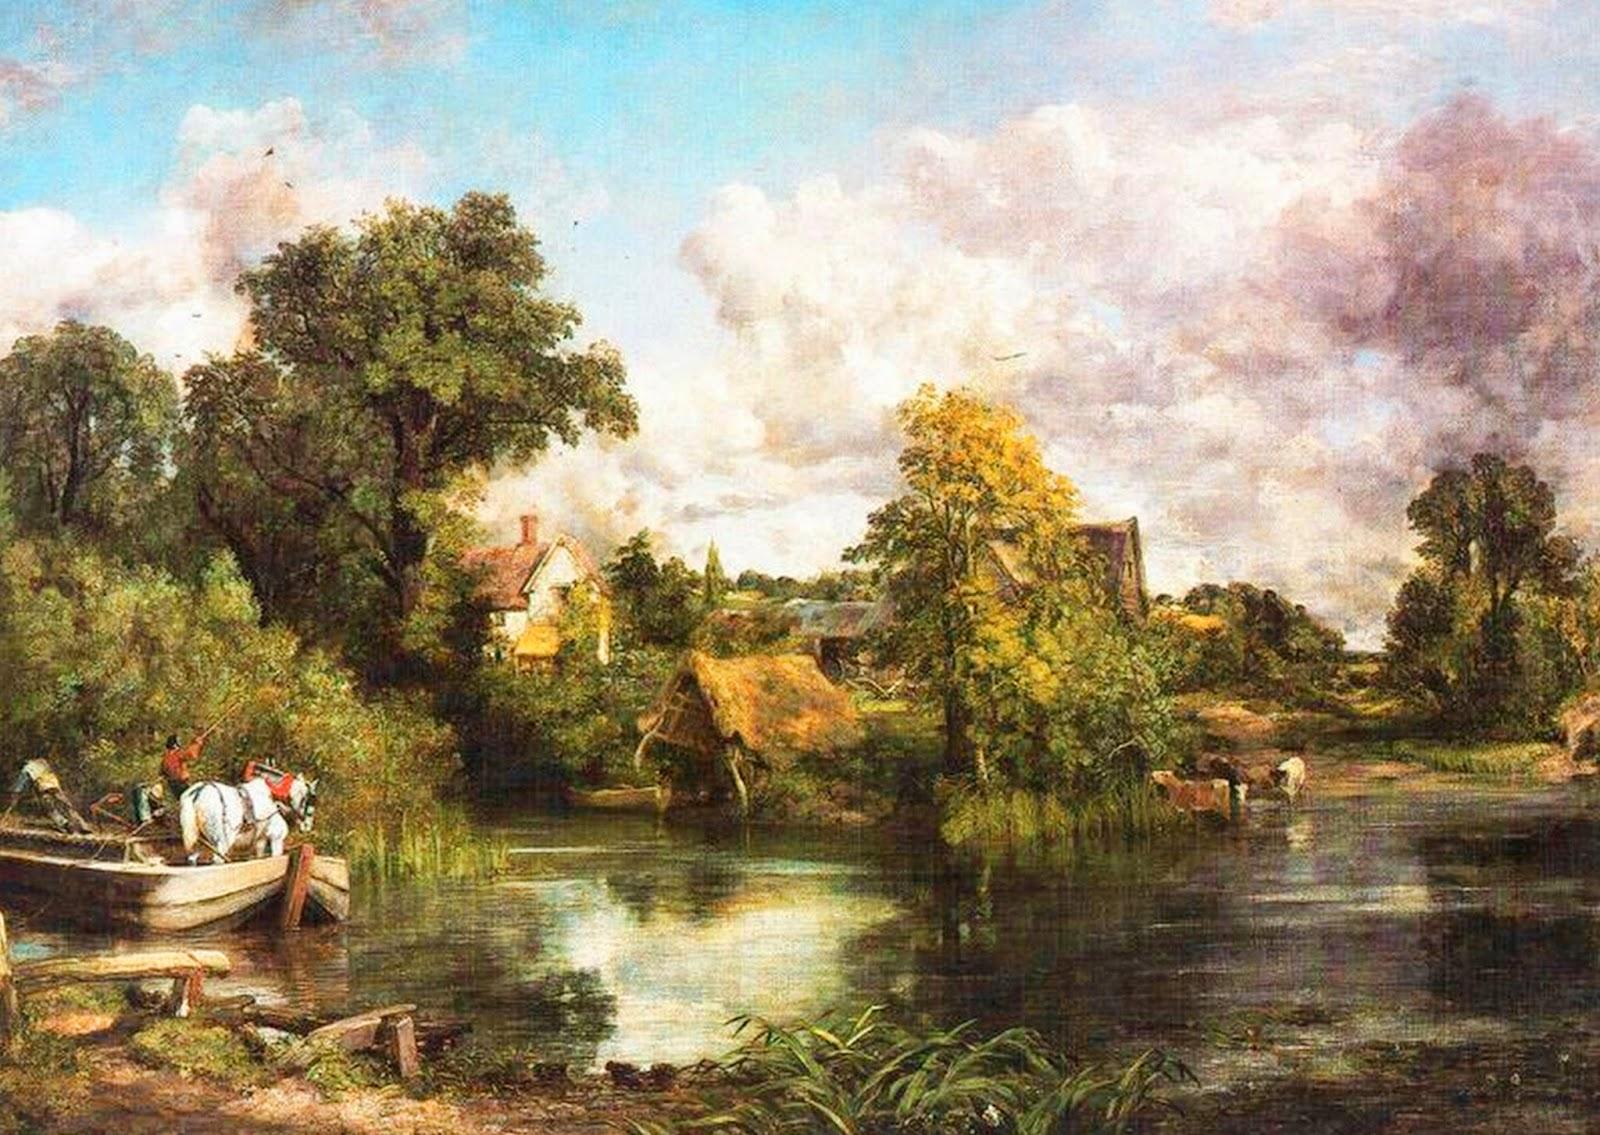 paisajes-clasicos-campesinos-de-Europa-cuadros-al-oleo-foto